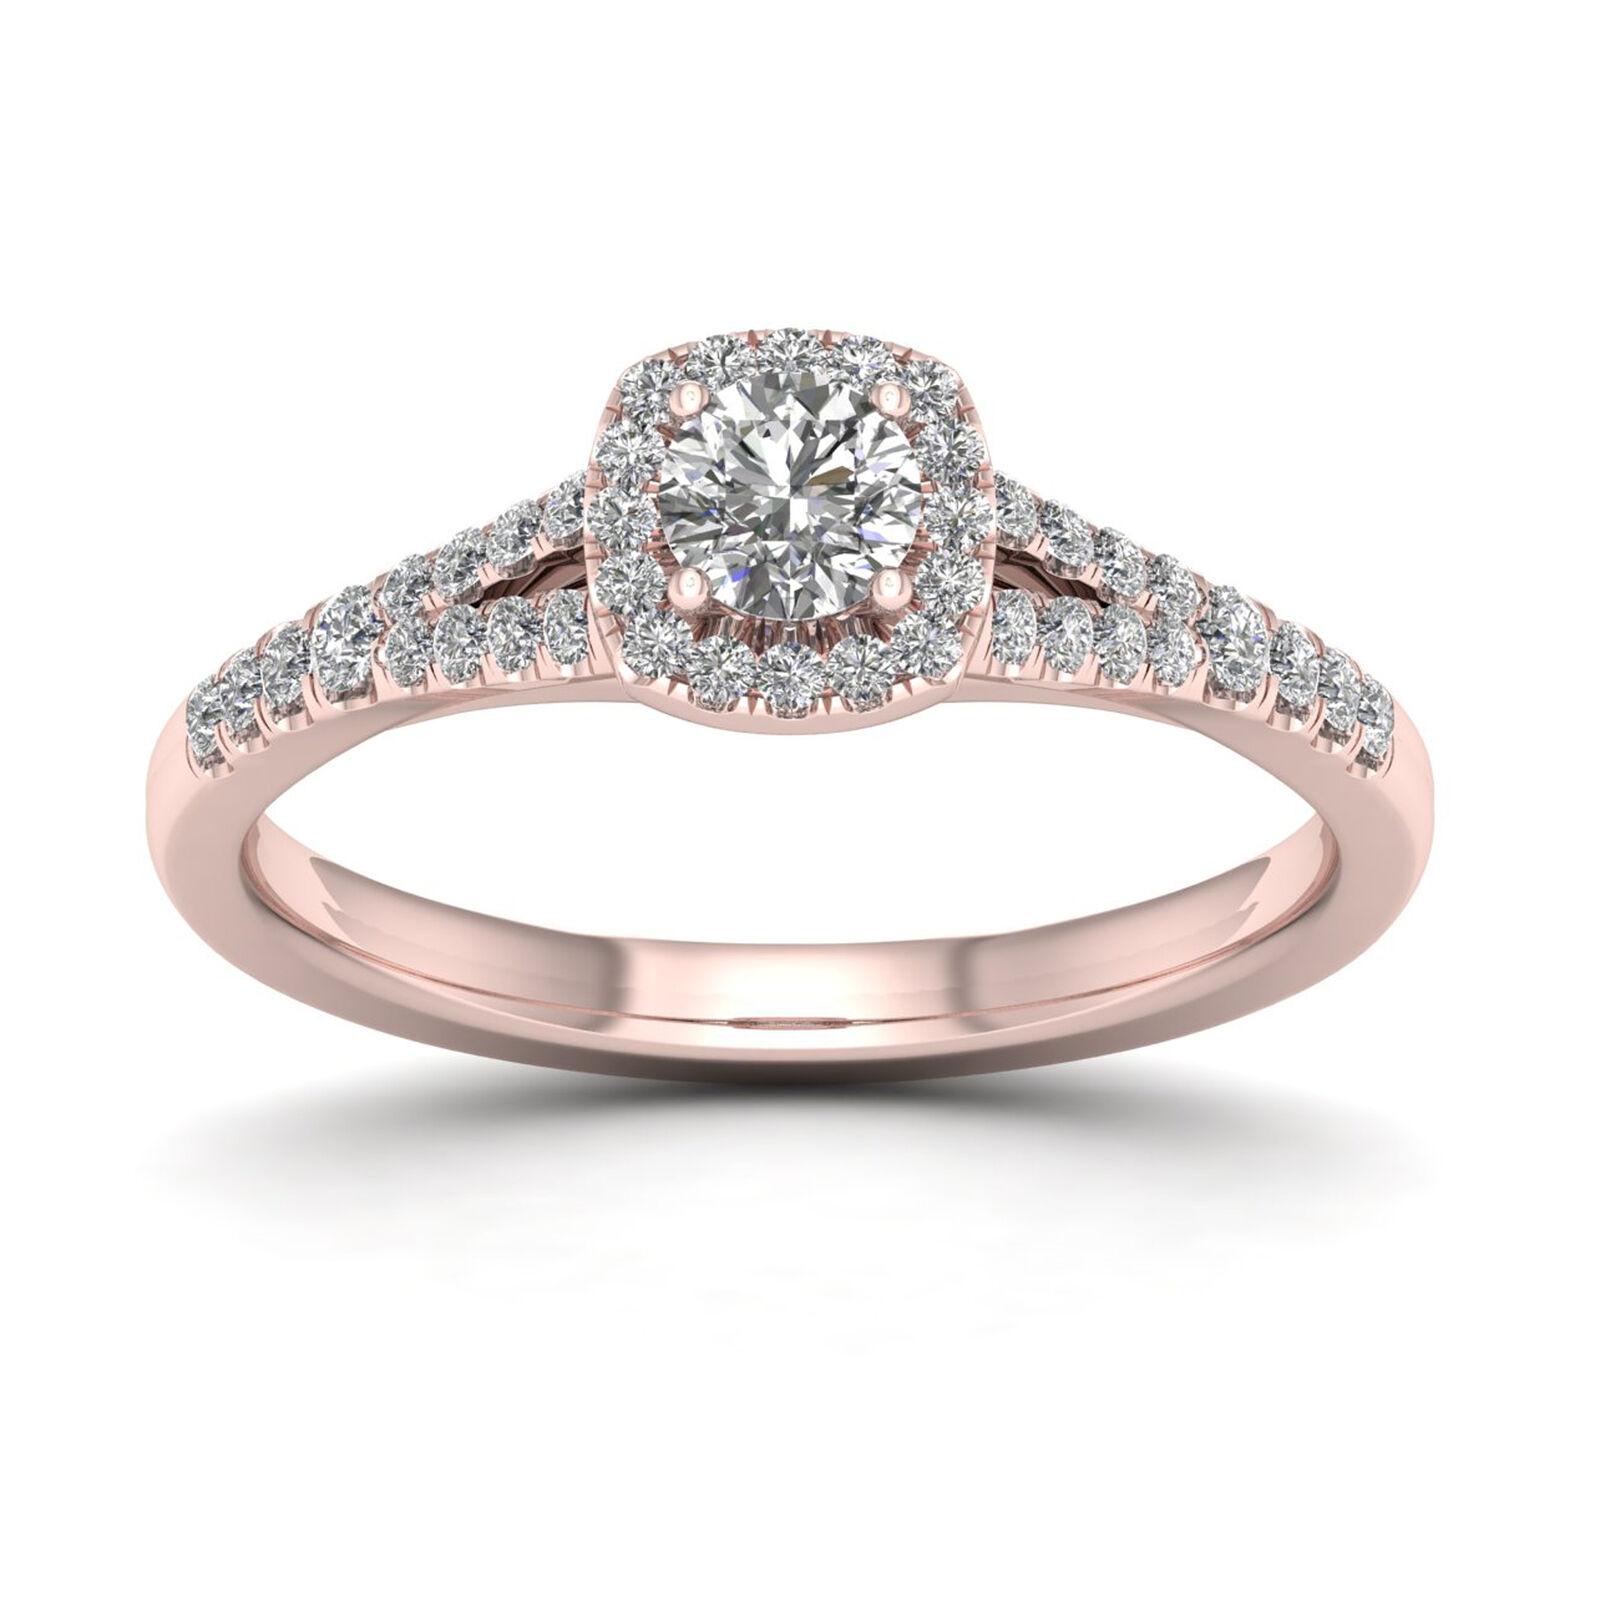 14k pink gold 3 4ct TDW Diamond Split Shank Ring